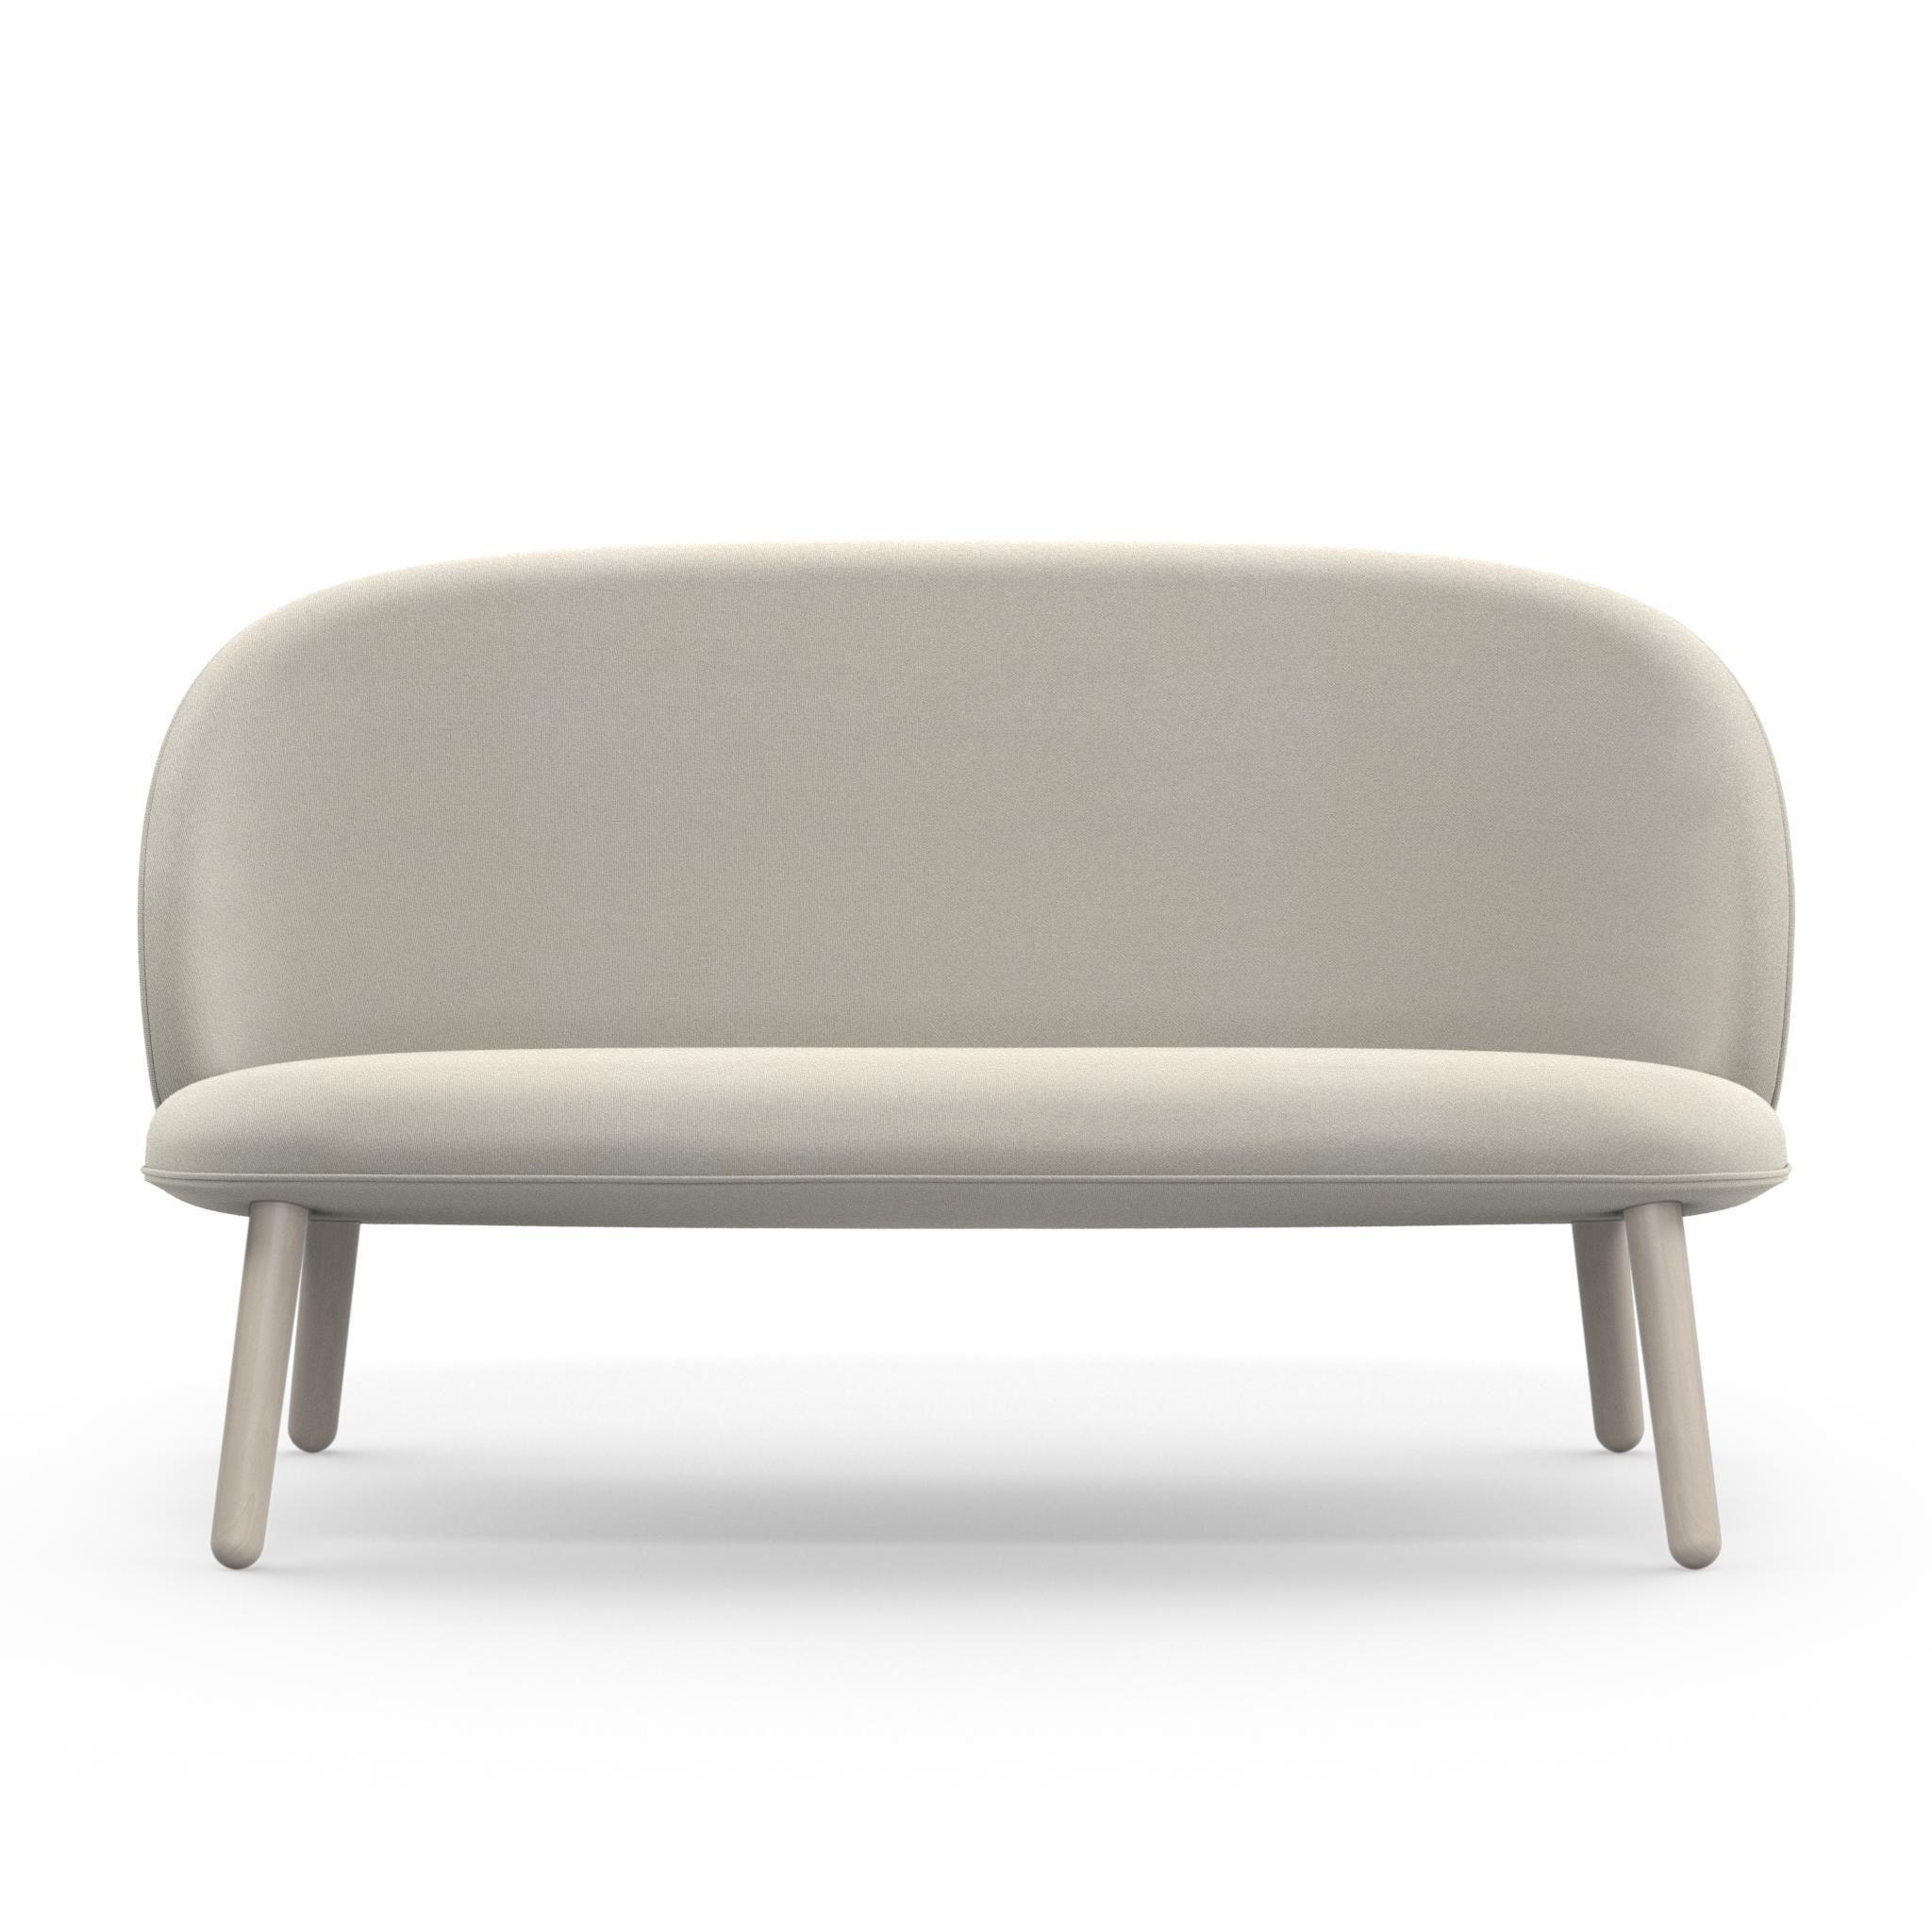 Scopri divano destro ace 2 posti l 145 cm tessuto - Divano 2 posti 140 cm ...